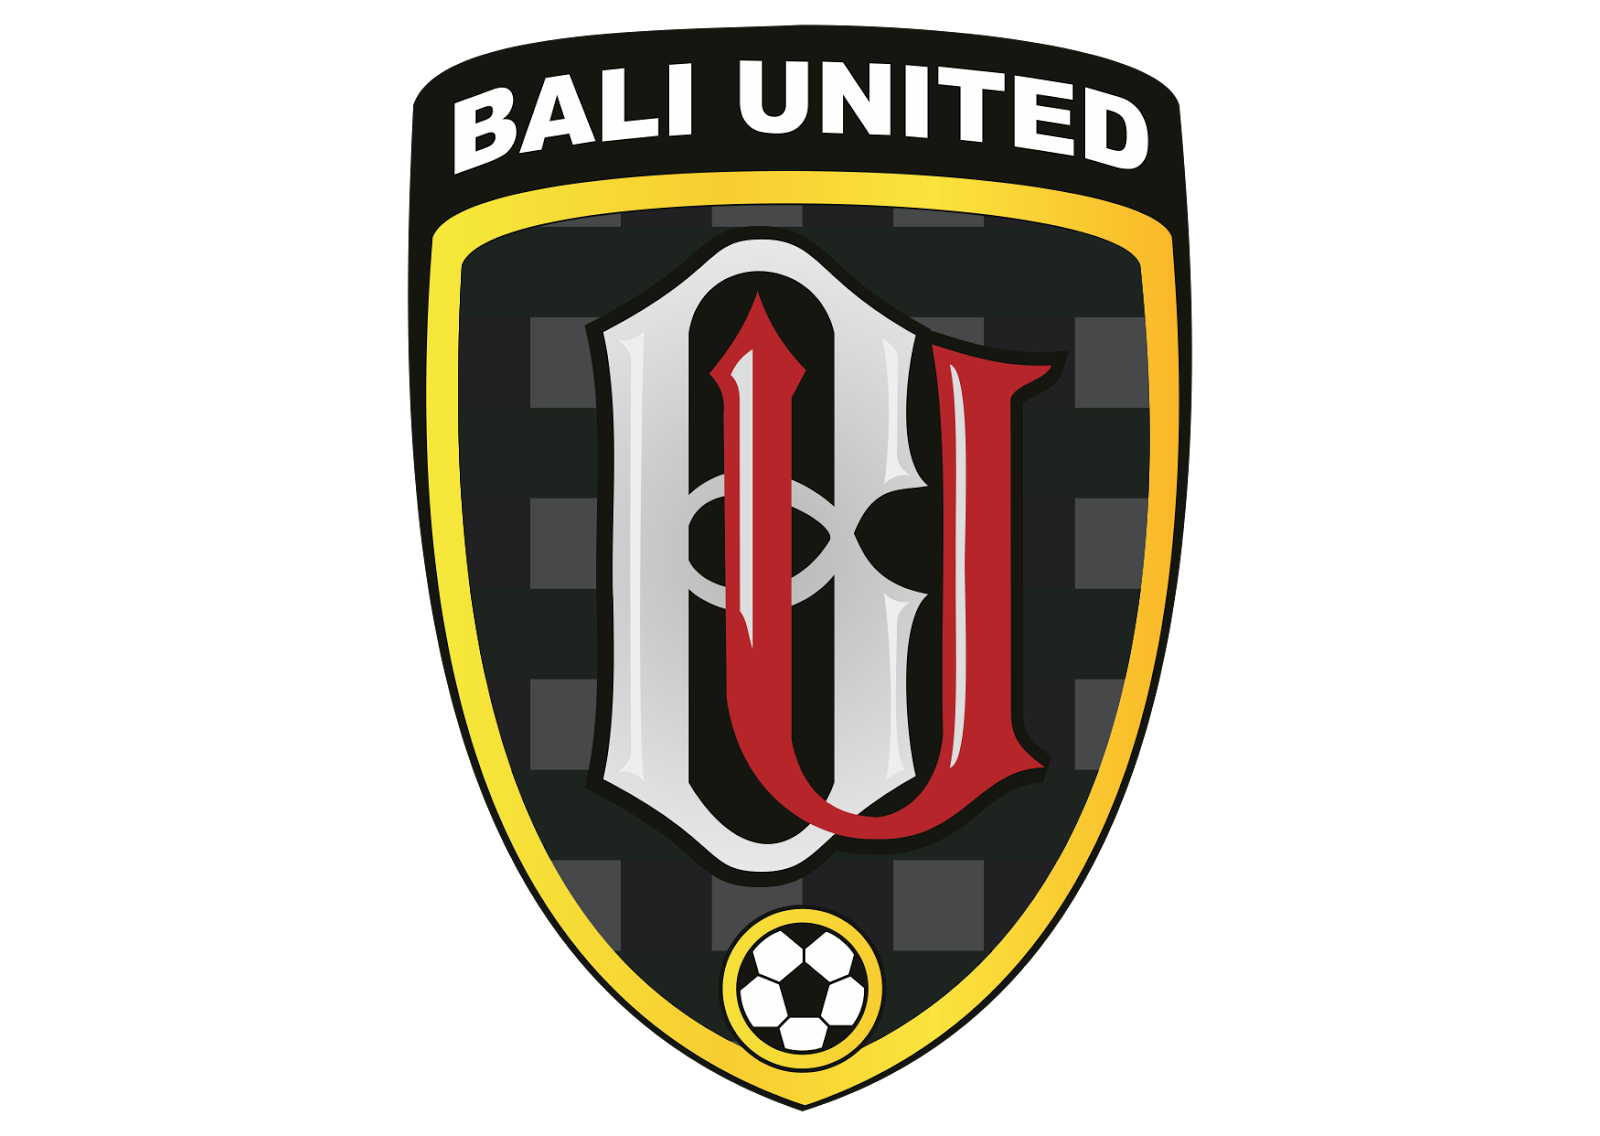 Bali United Pusam Fc Logo Vector Format Cdr, Ai, Eps